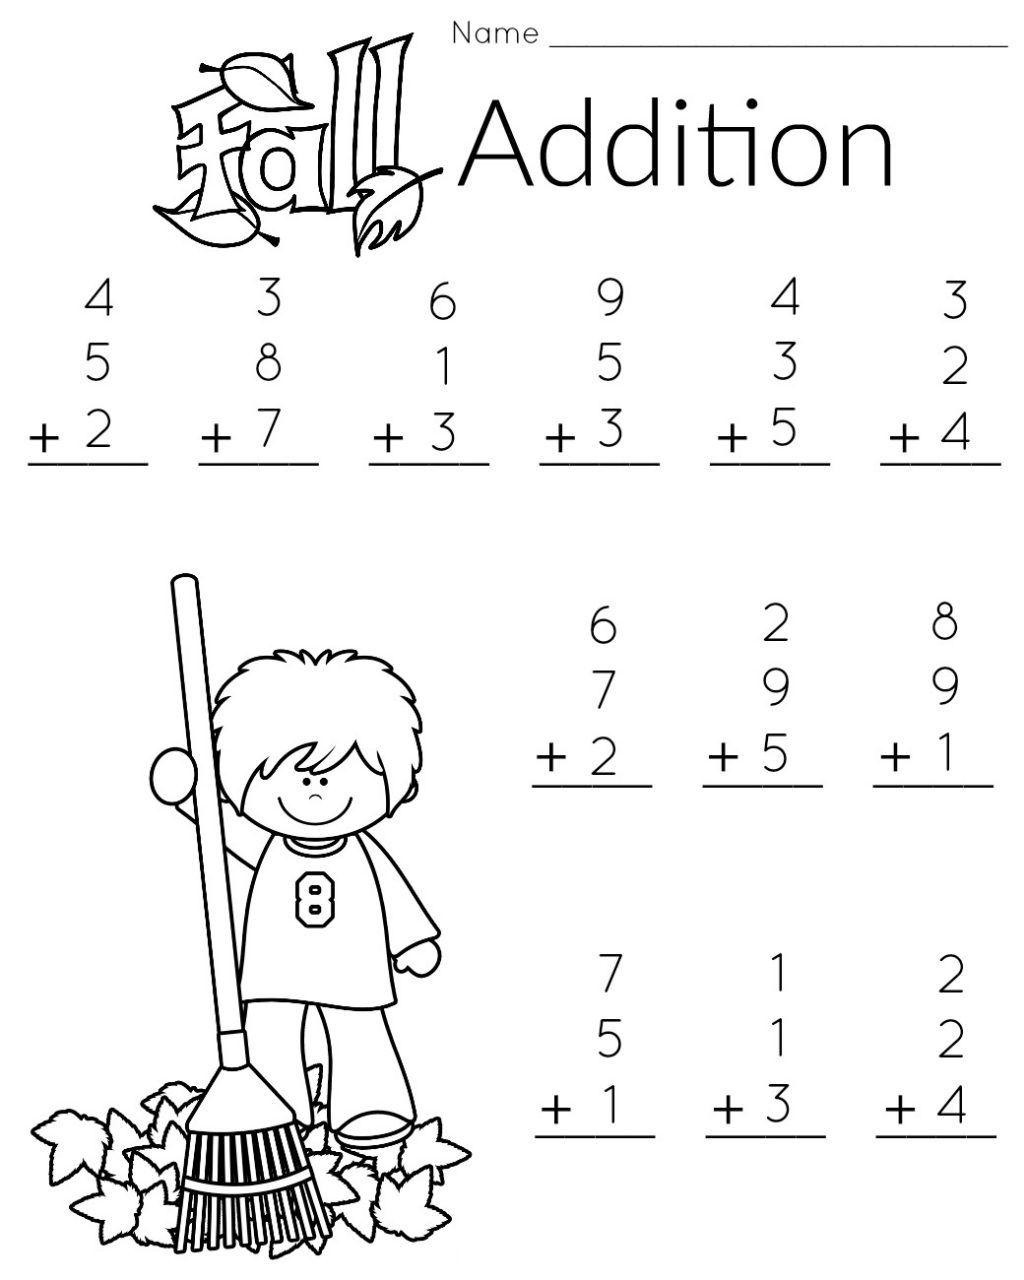 hight resolution of 20 Best Kindergarten Math Worksheets Adding images on Best Worksheets  Collection